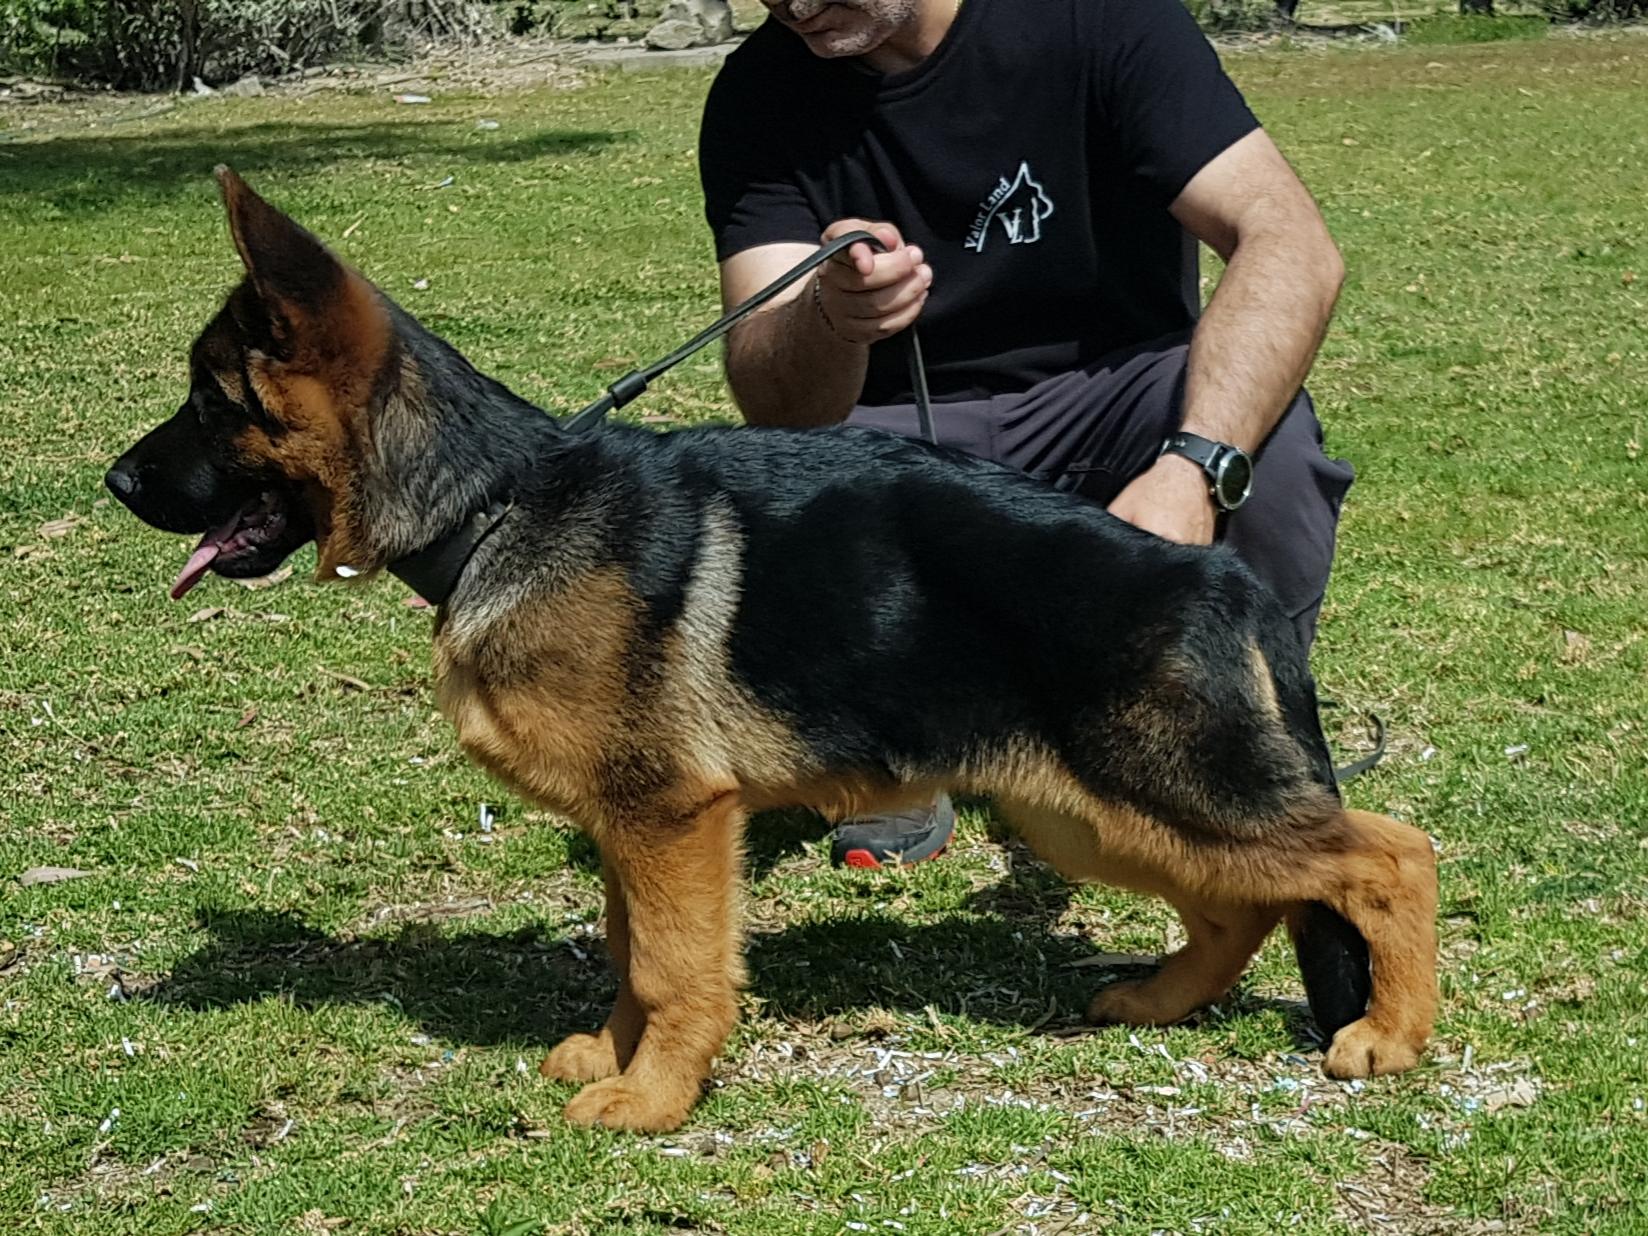 ValorLand German Shepherds